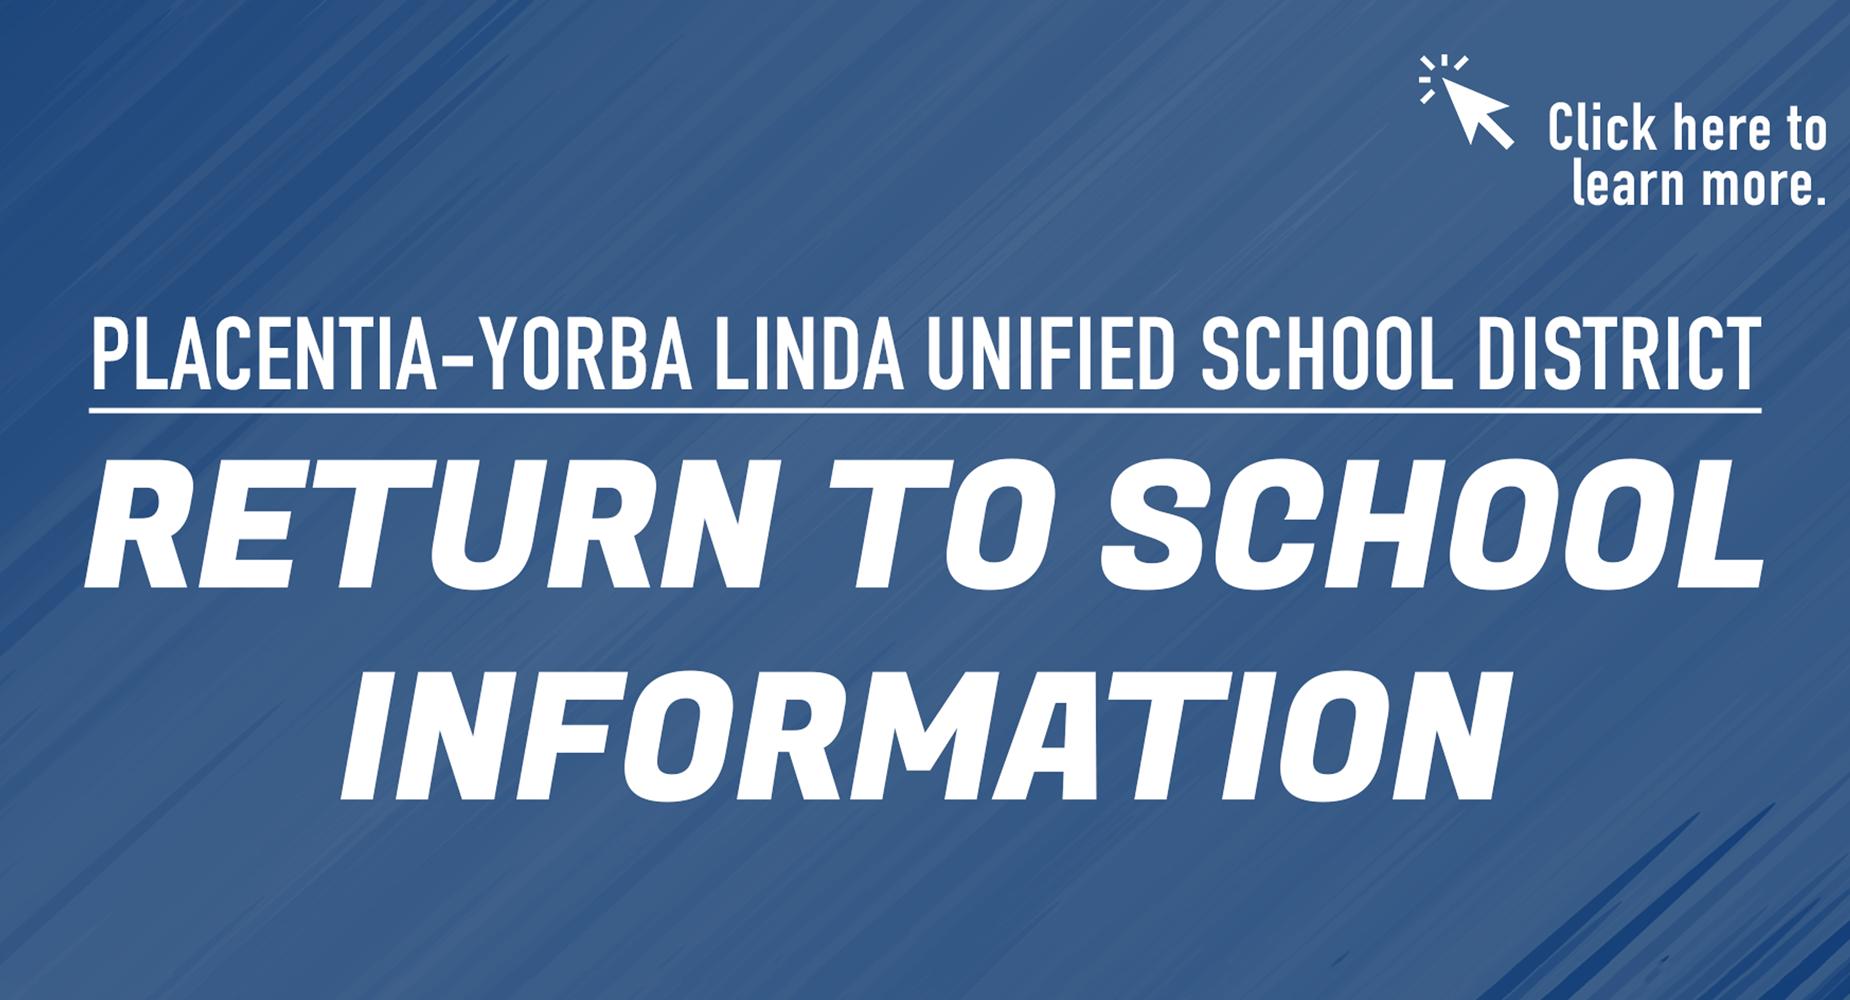 Return to School information.